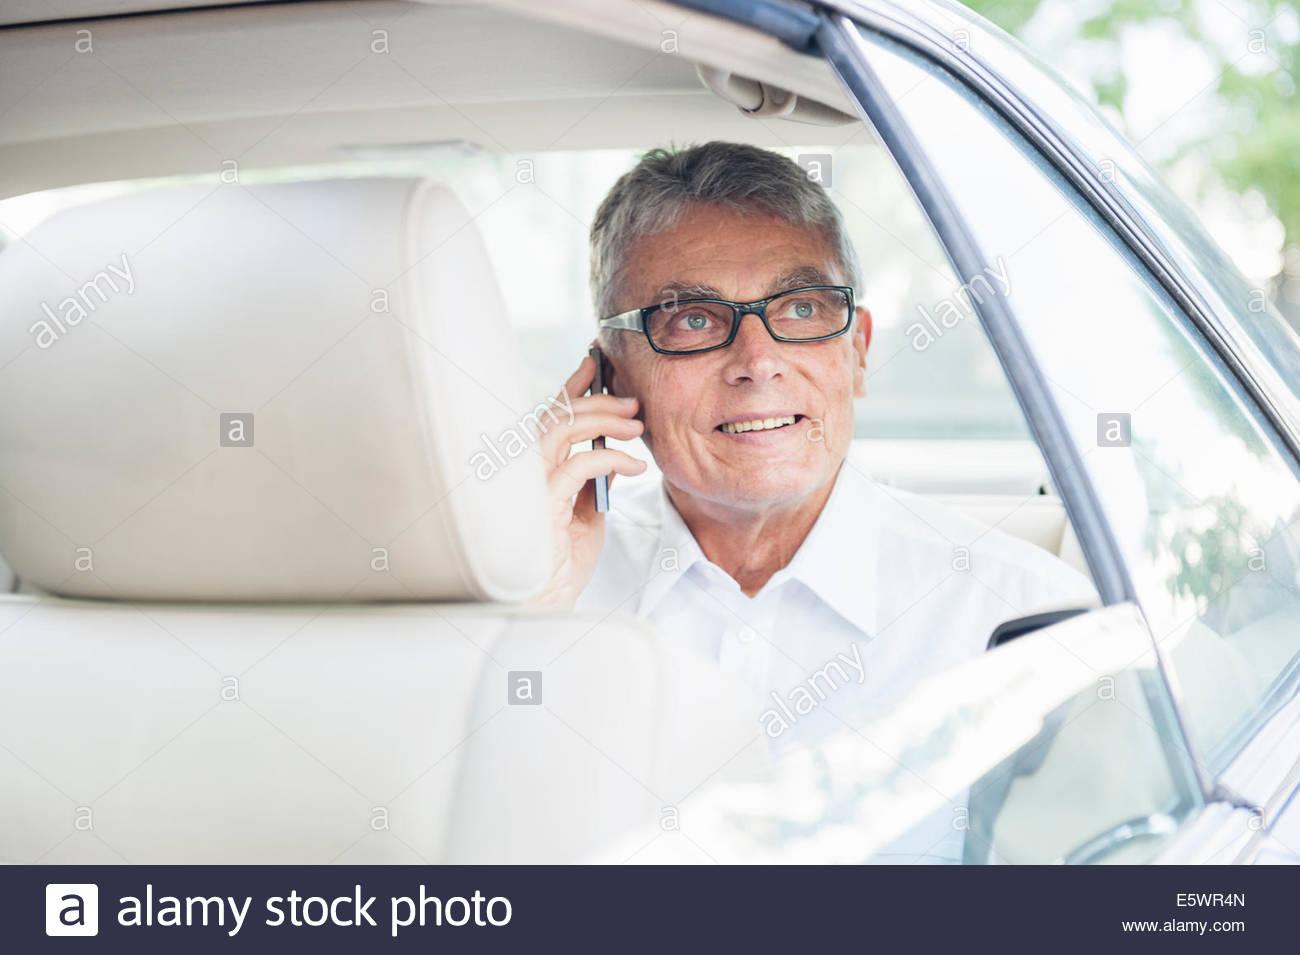 Senior adult businessman in car, using mobile phone - Stock Image